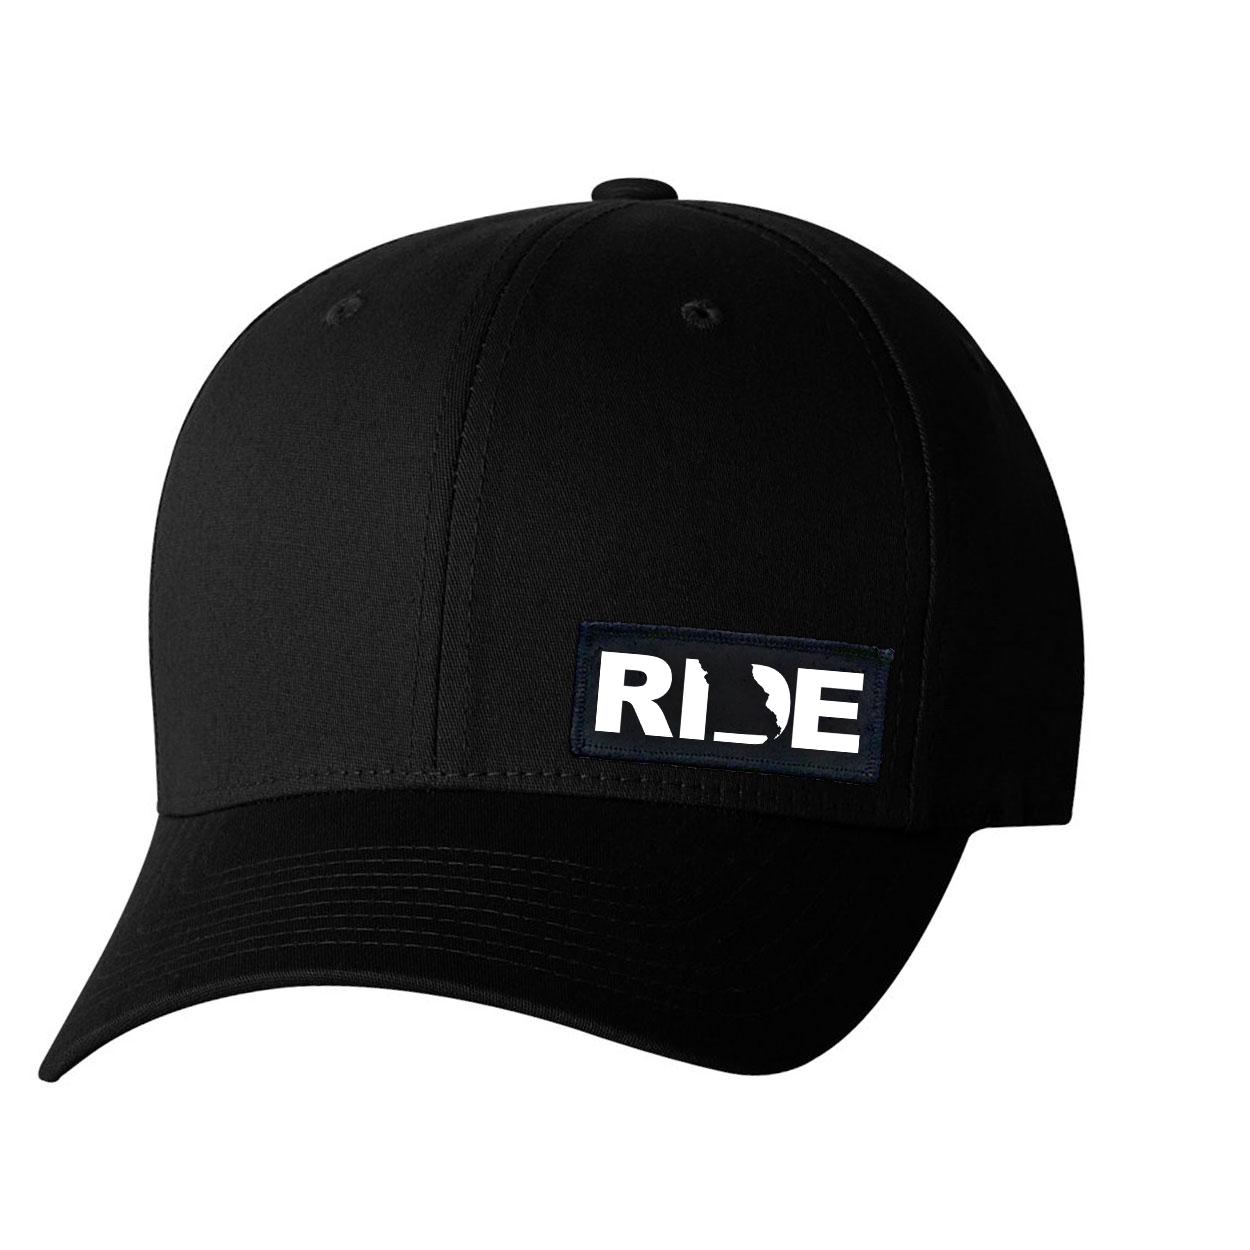 Ride Missouri Night Out Woven Patch Flex-Fit Hat Black (White Logo)